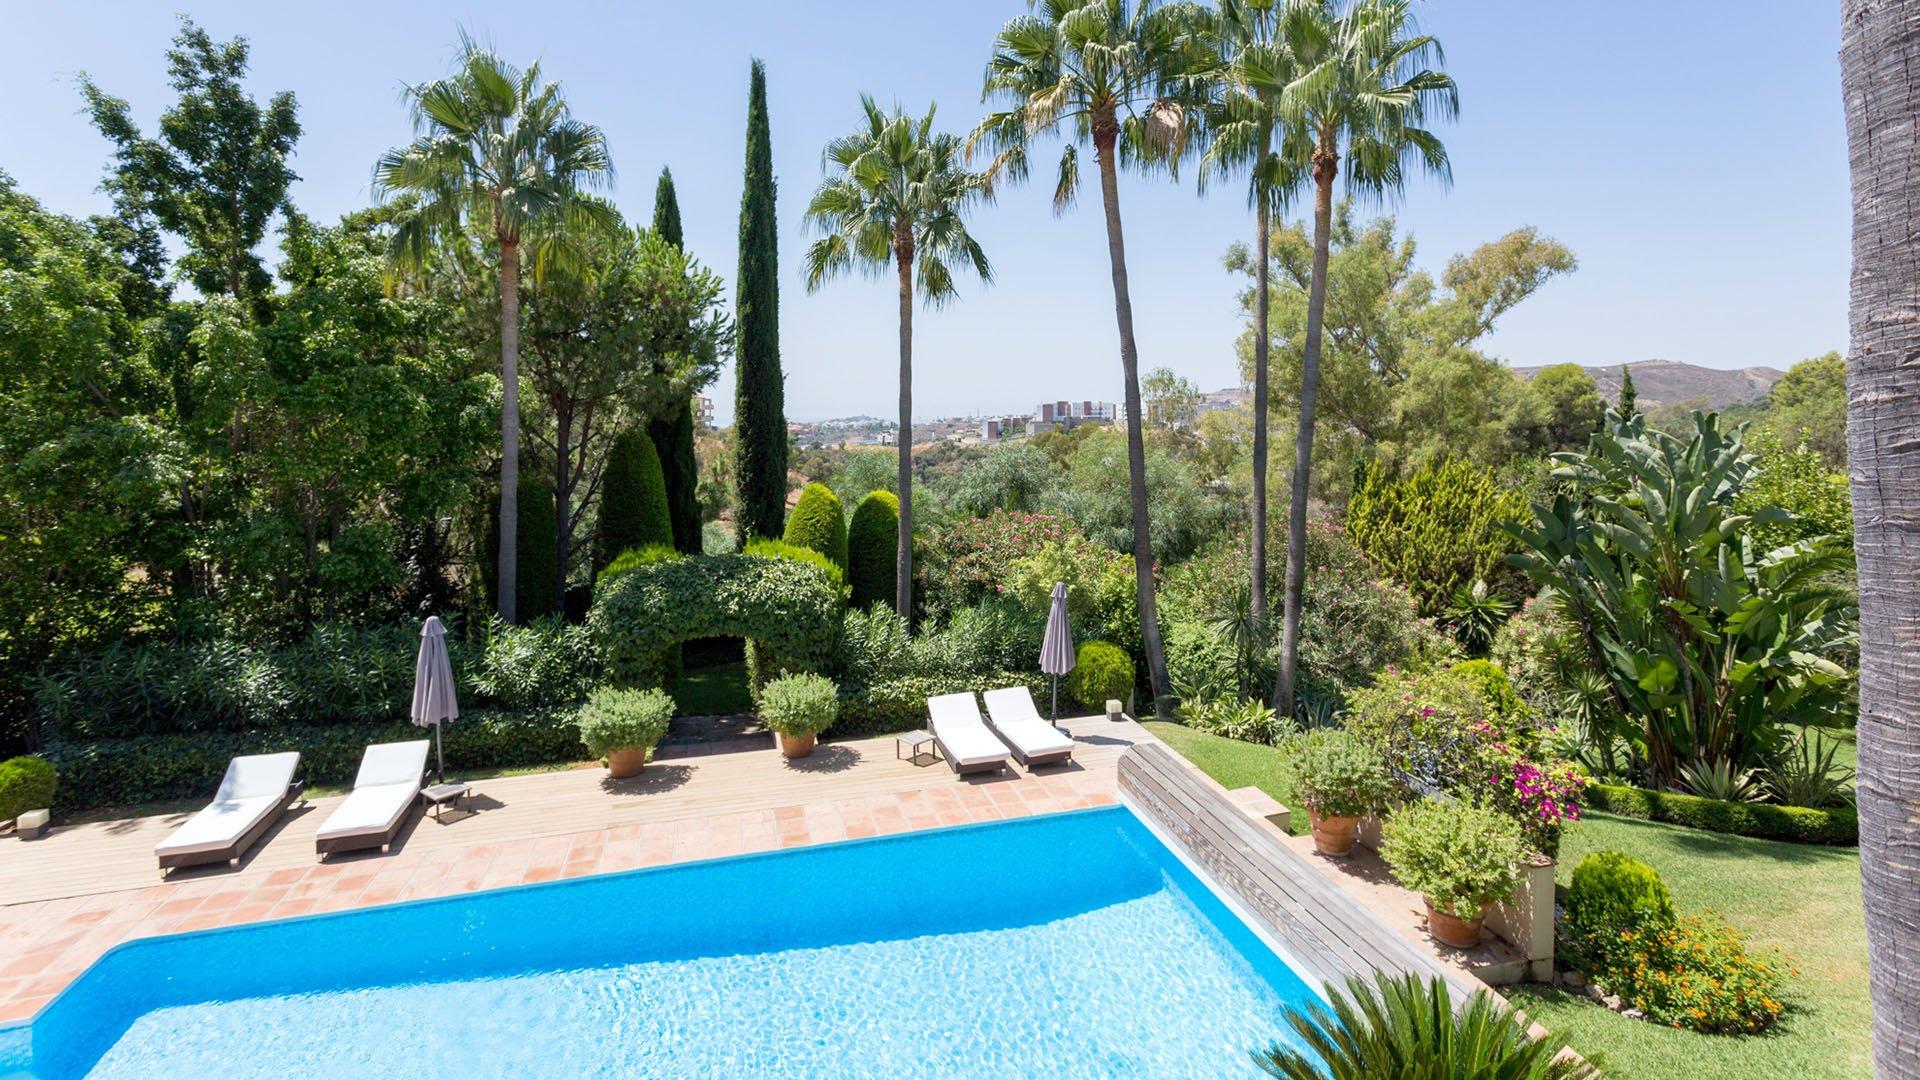 Villa Lara: Charmante villa met een mooie tuin in Benahavís